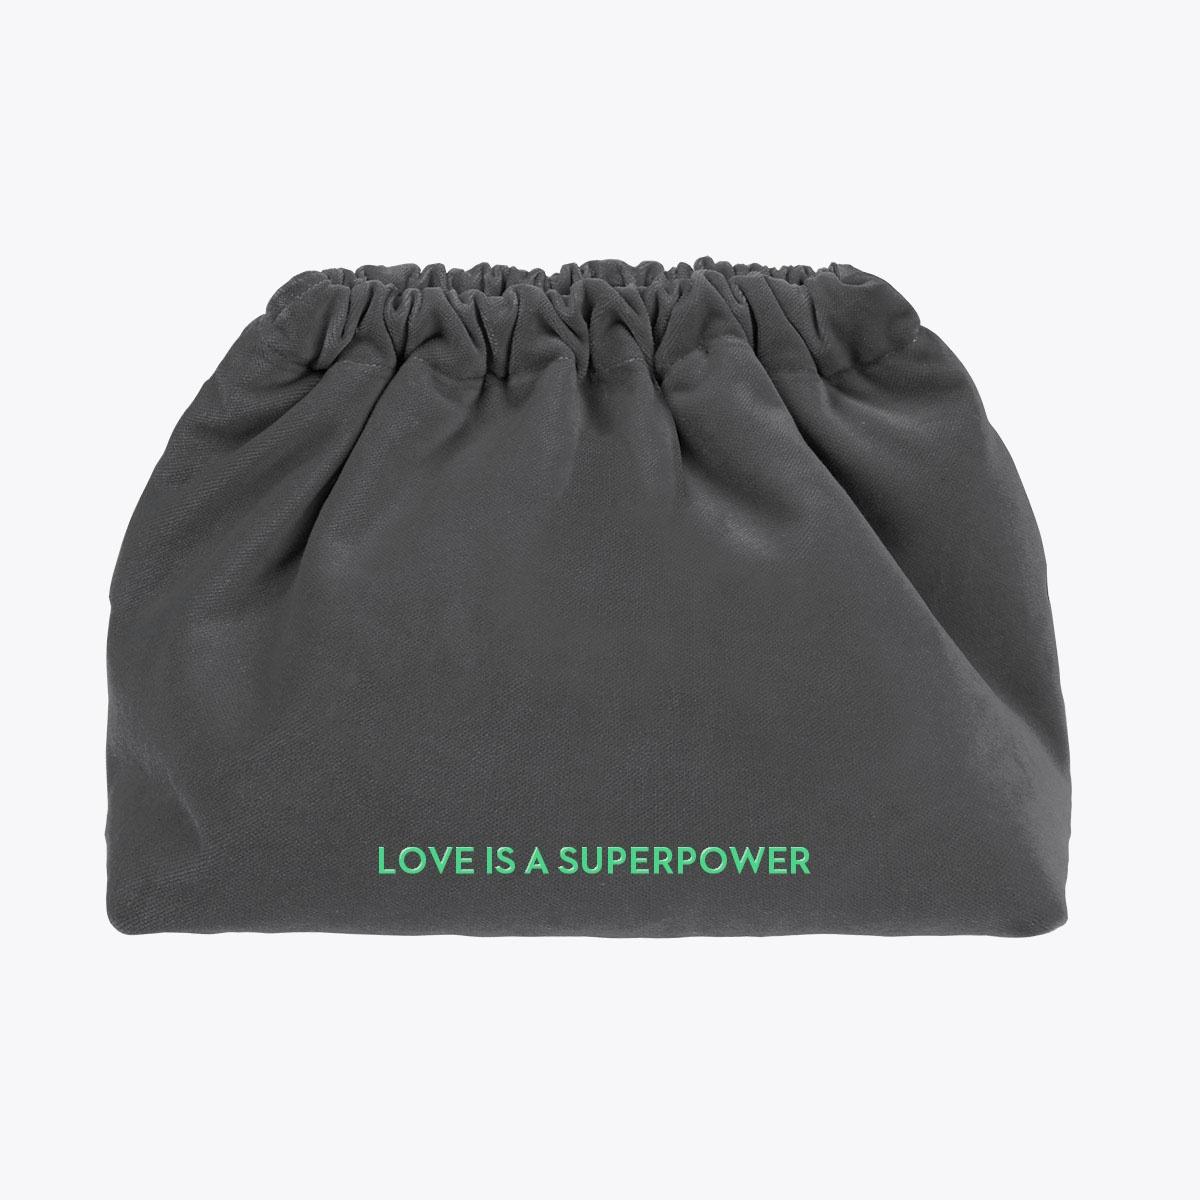 love-is-a-superpower-velvet-clutch-bag-vebl0023